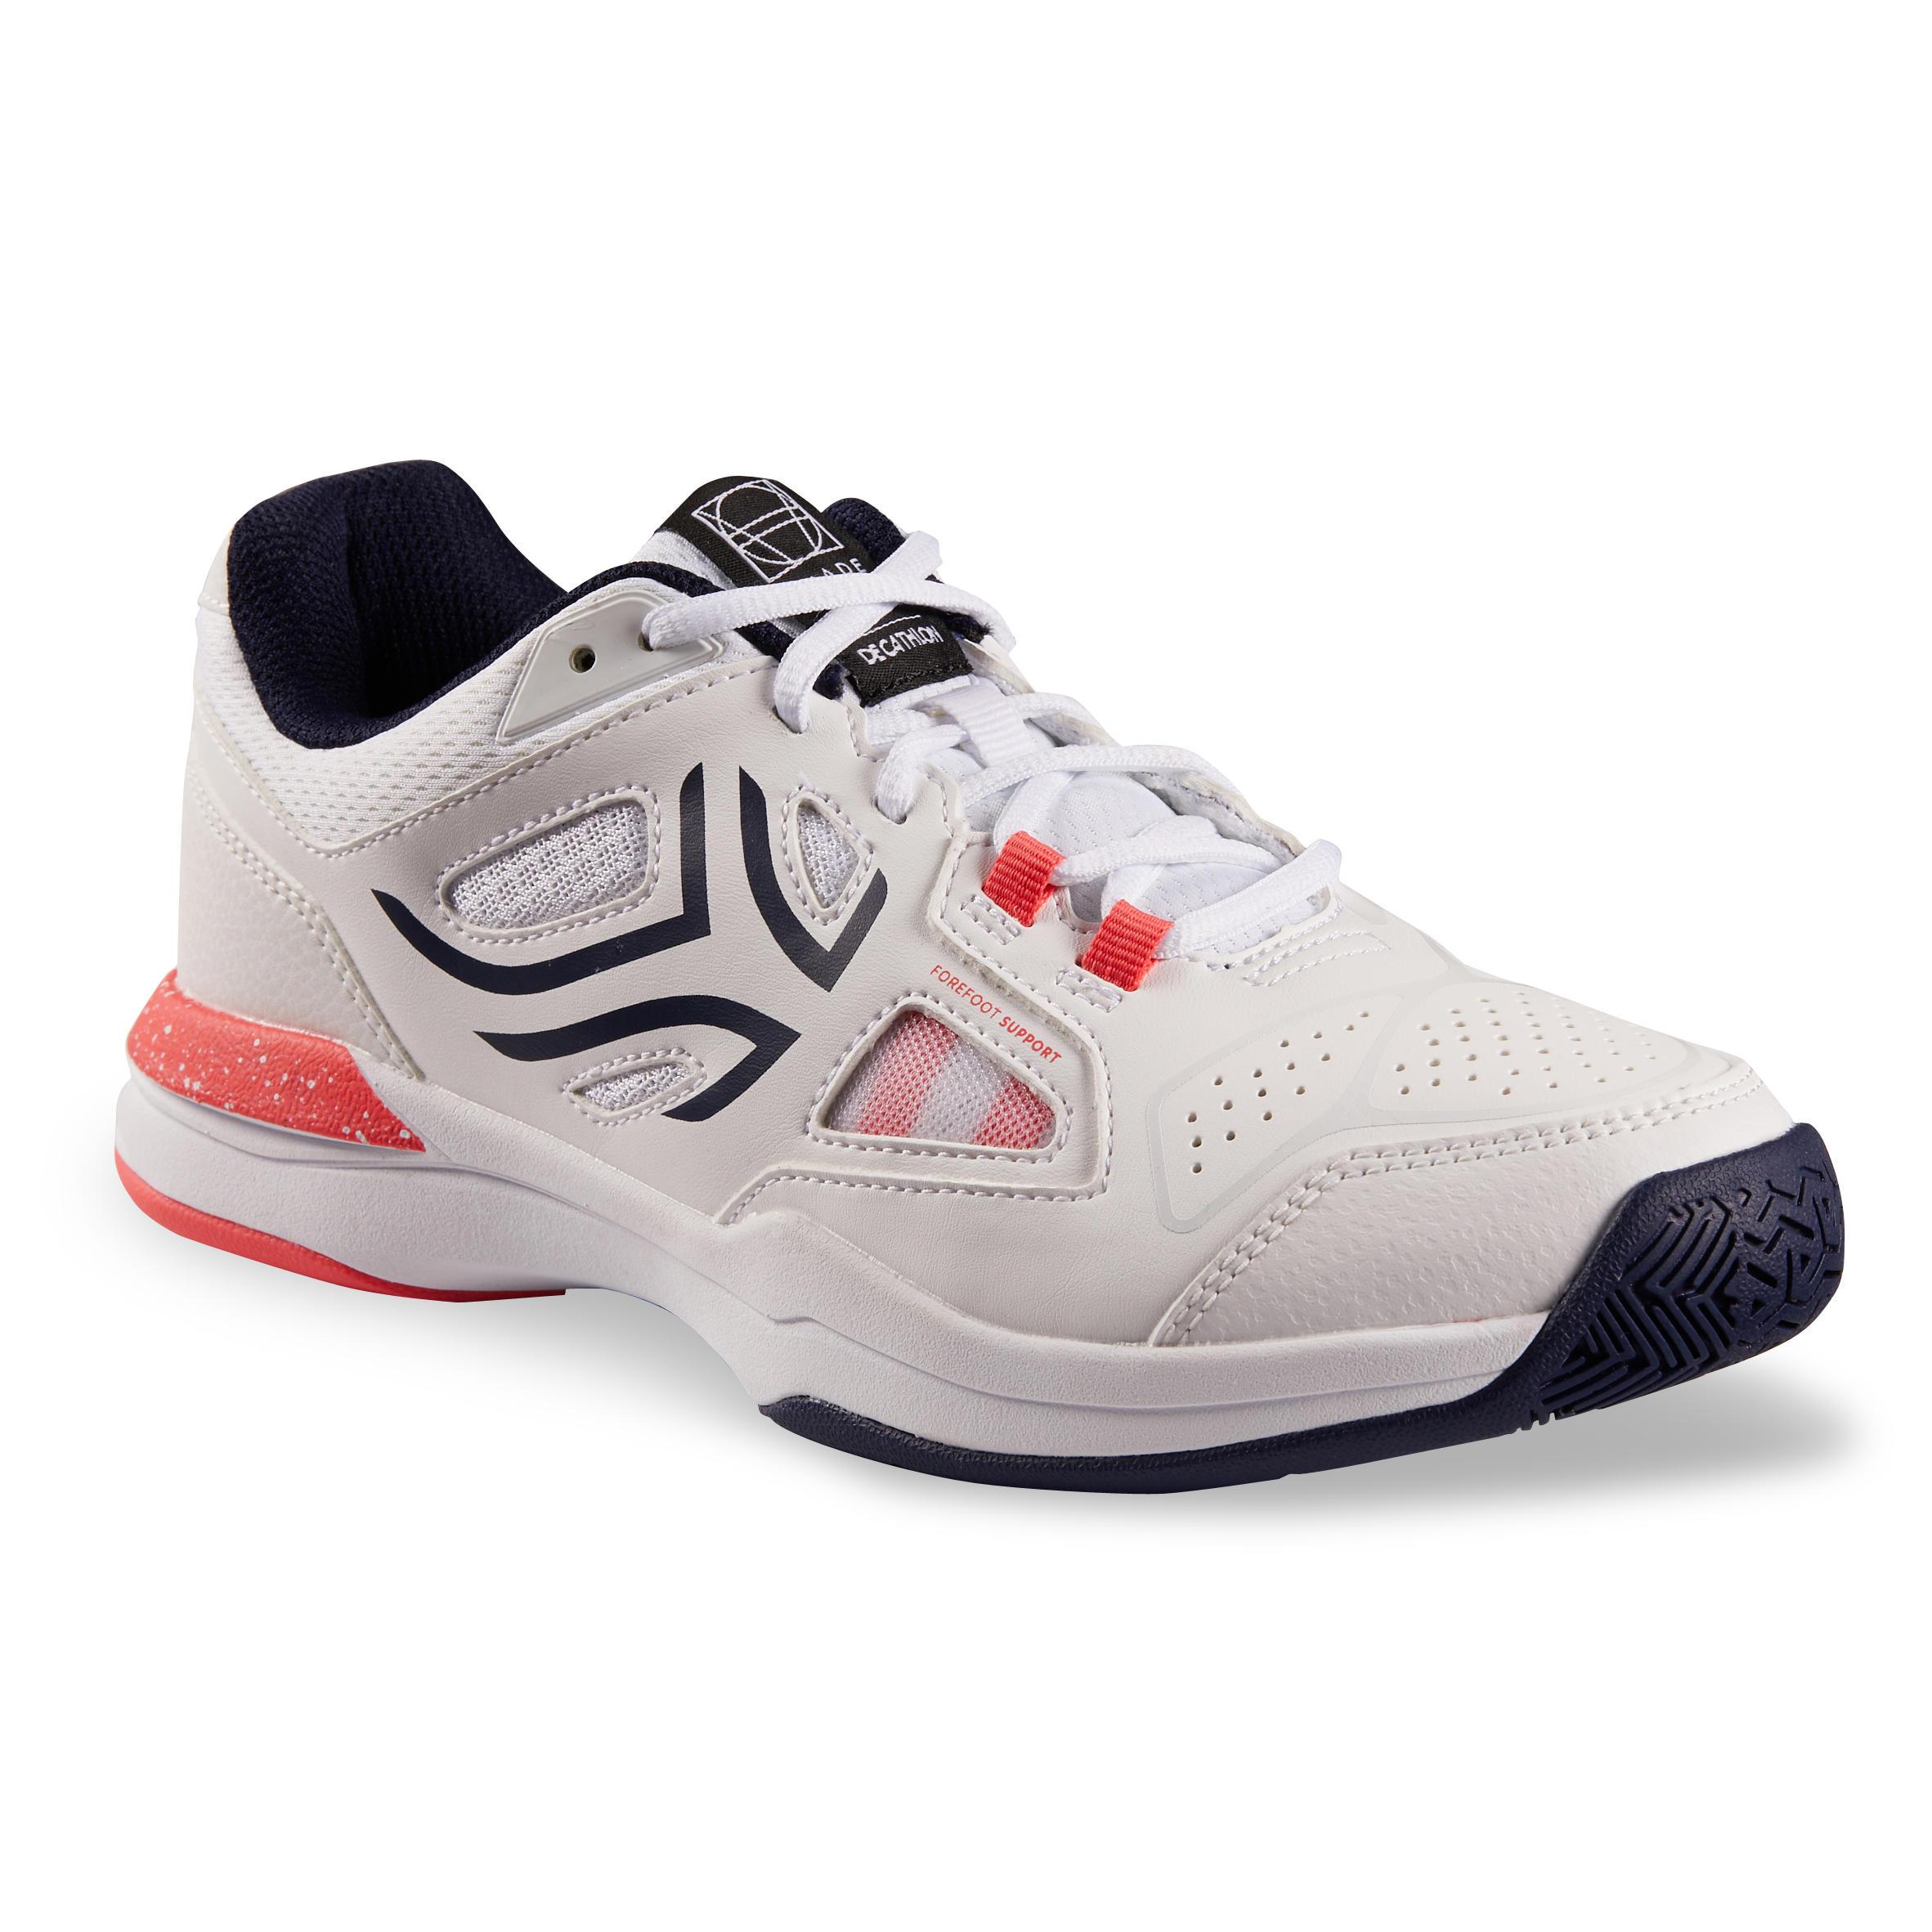 Zapatillas 500 Blanco De Tenis Ts Mujer nmwN8v0